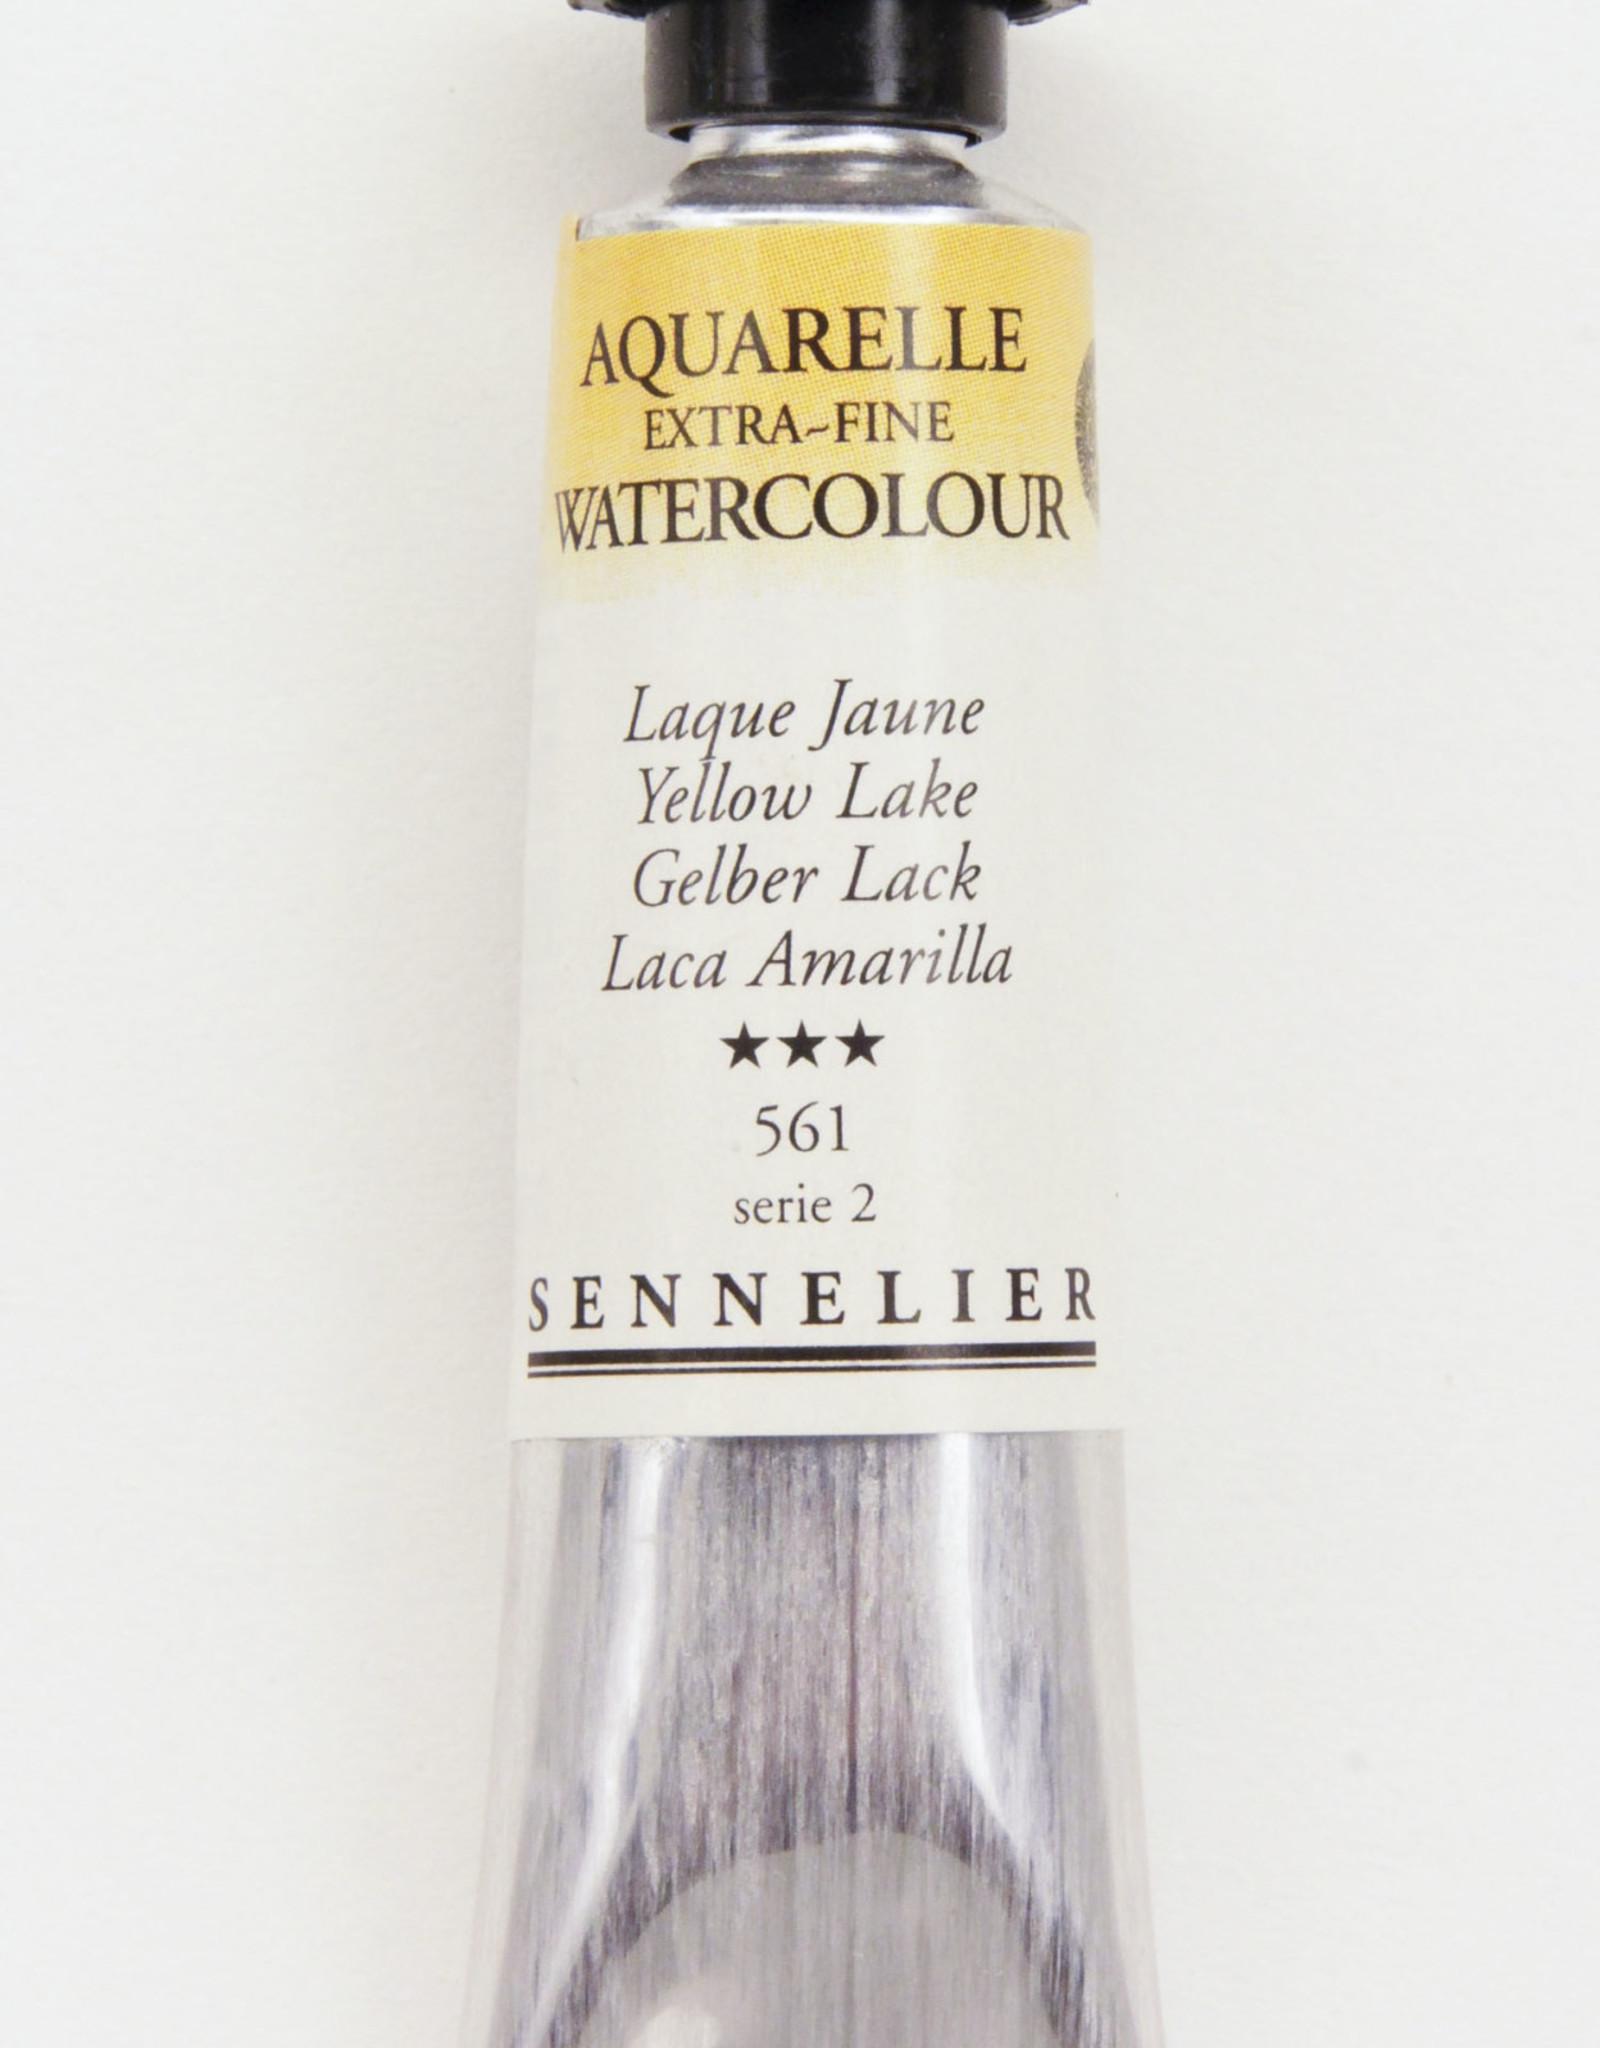 Sennelier, Aquarelle Watercolor Paint, Yellow Lake, 561,10ml Tube, Series 2